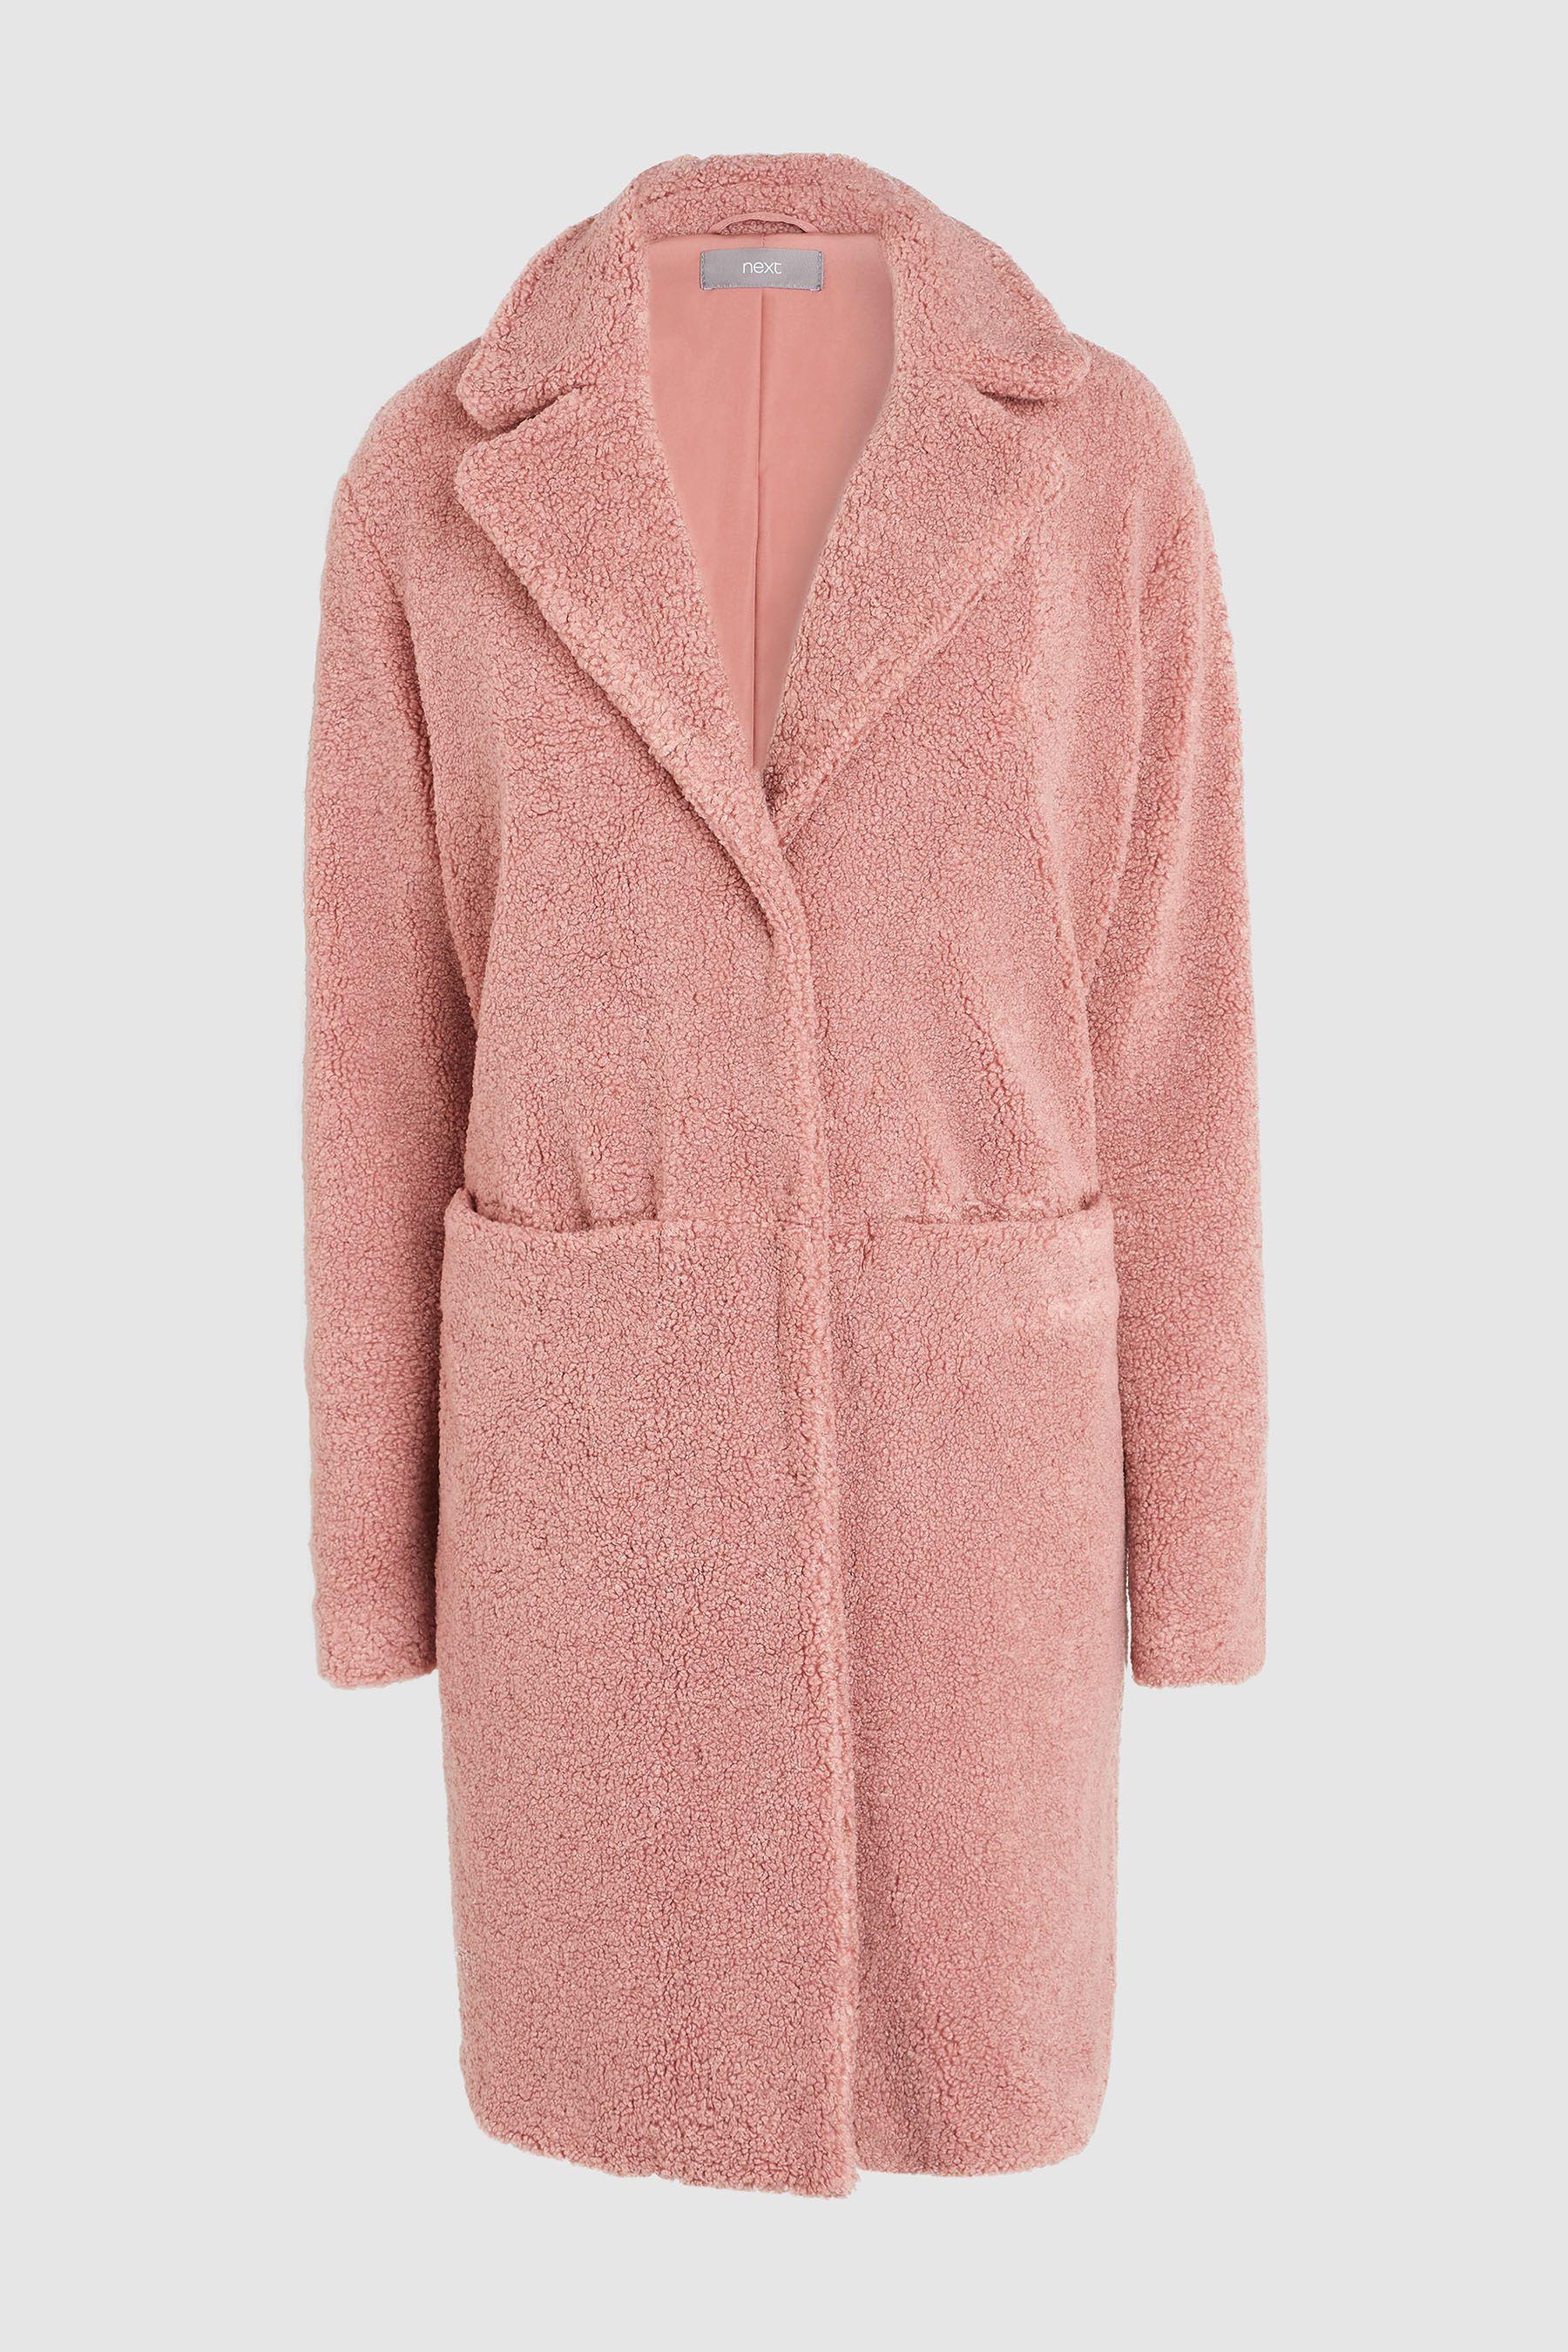 Womens Next Blush Teddy Borg Coat